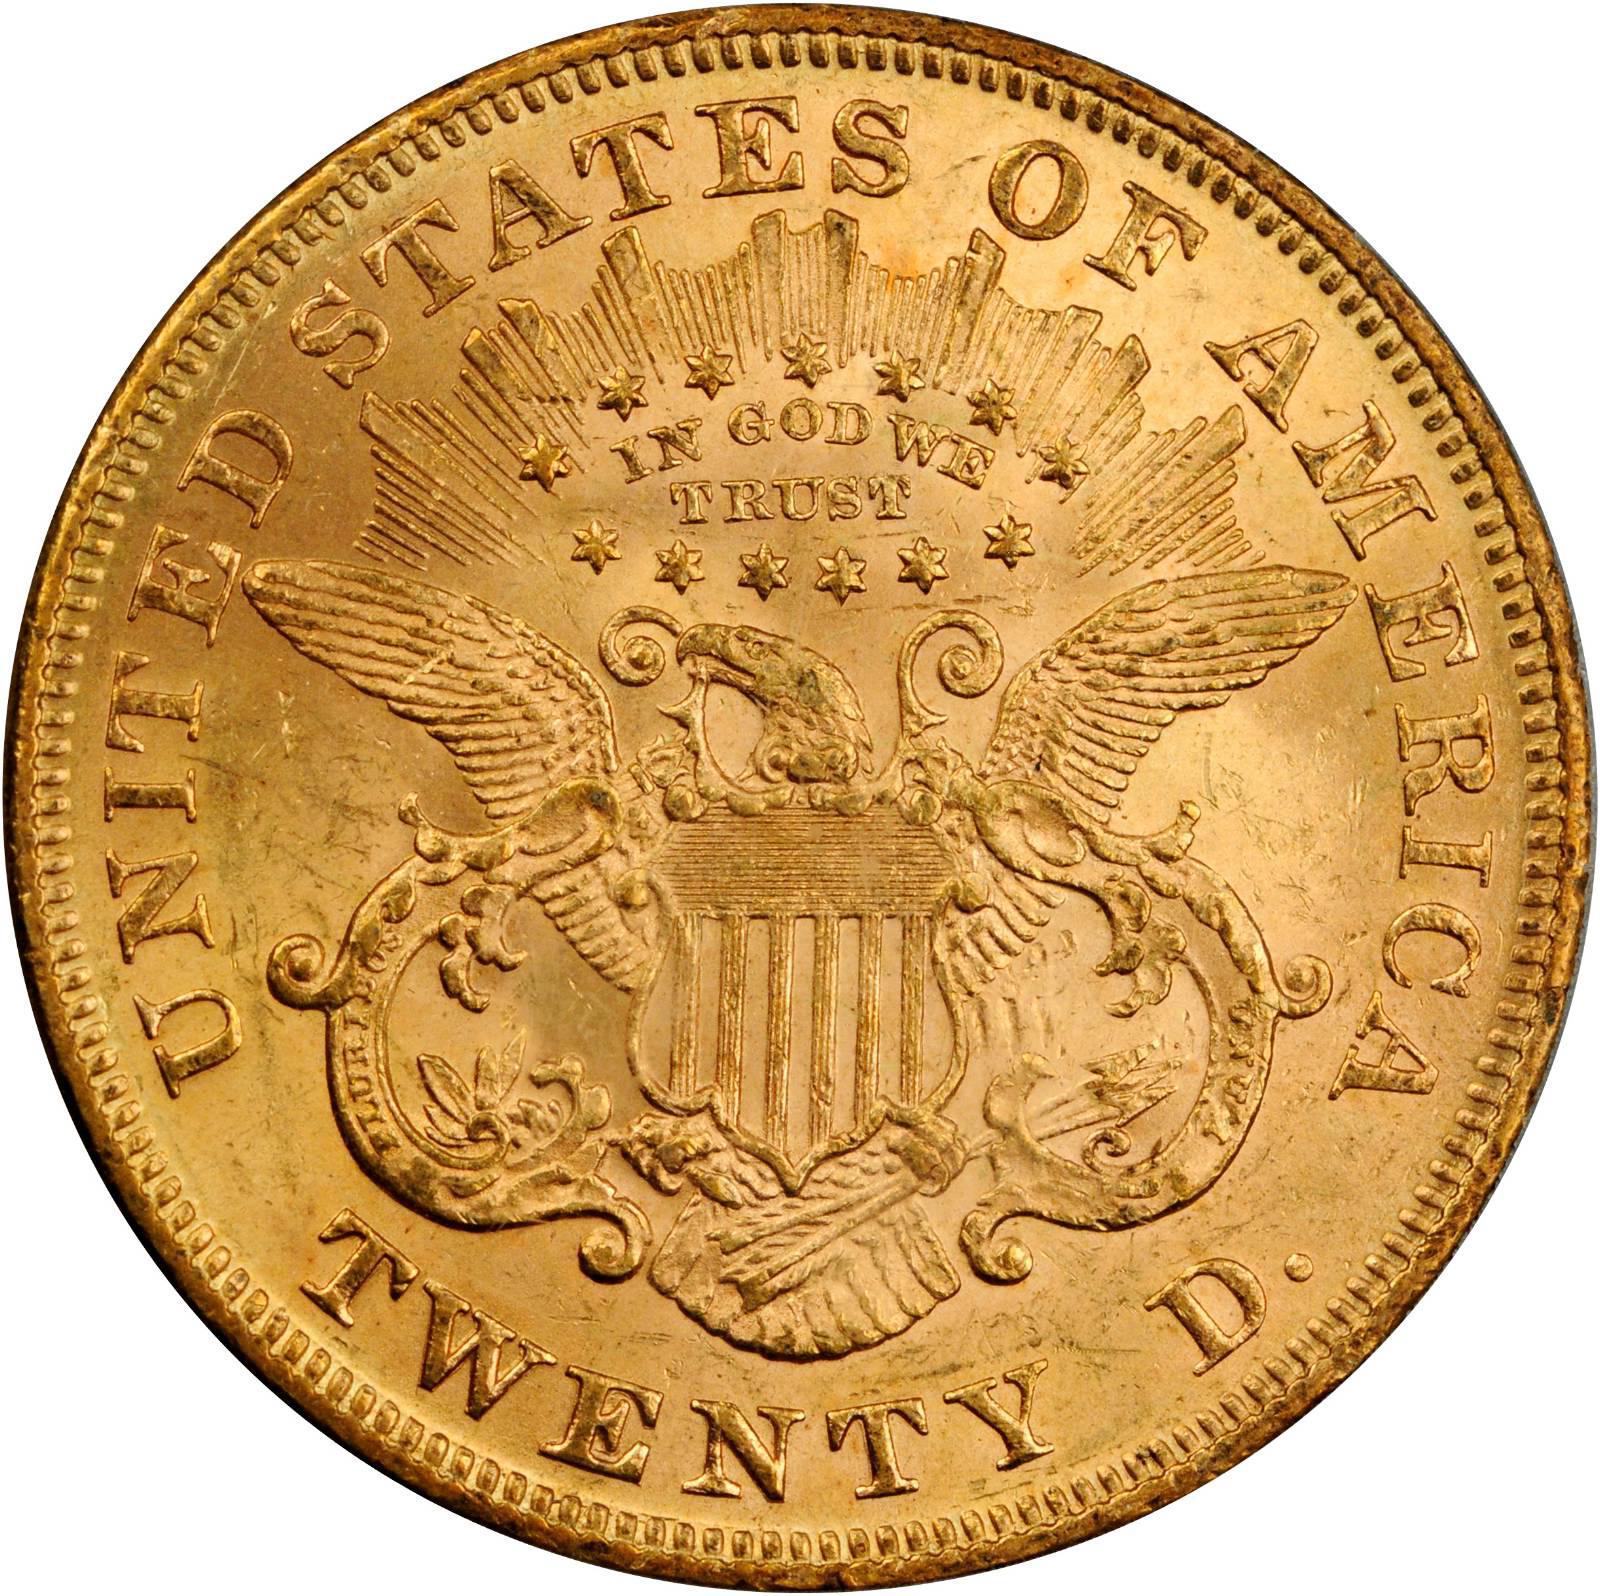 1875 quarter dollar coin value